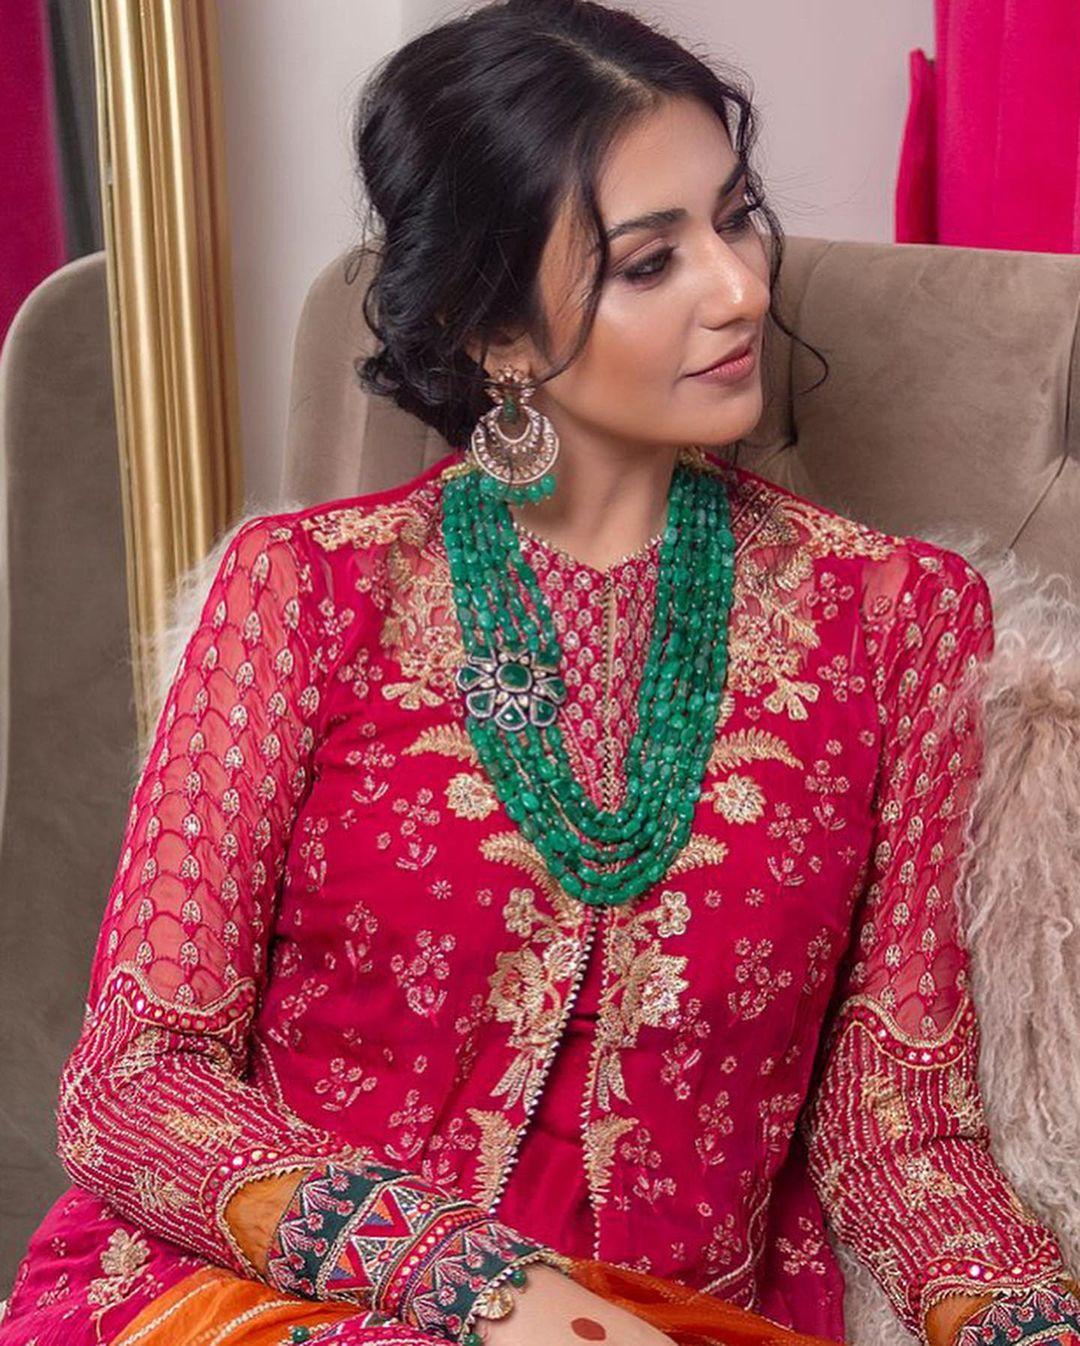 Sarah Khan's Best Formal Looks After Her Wedding